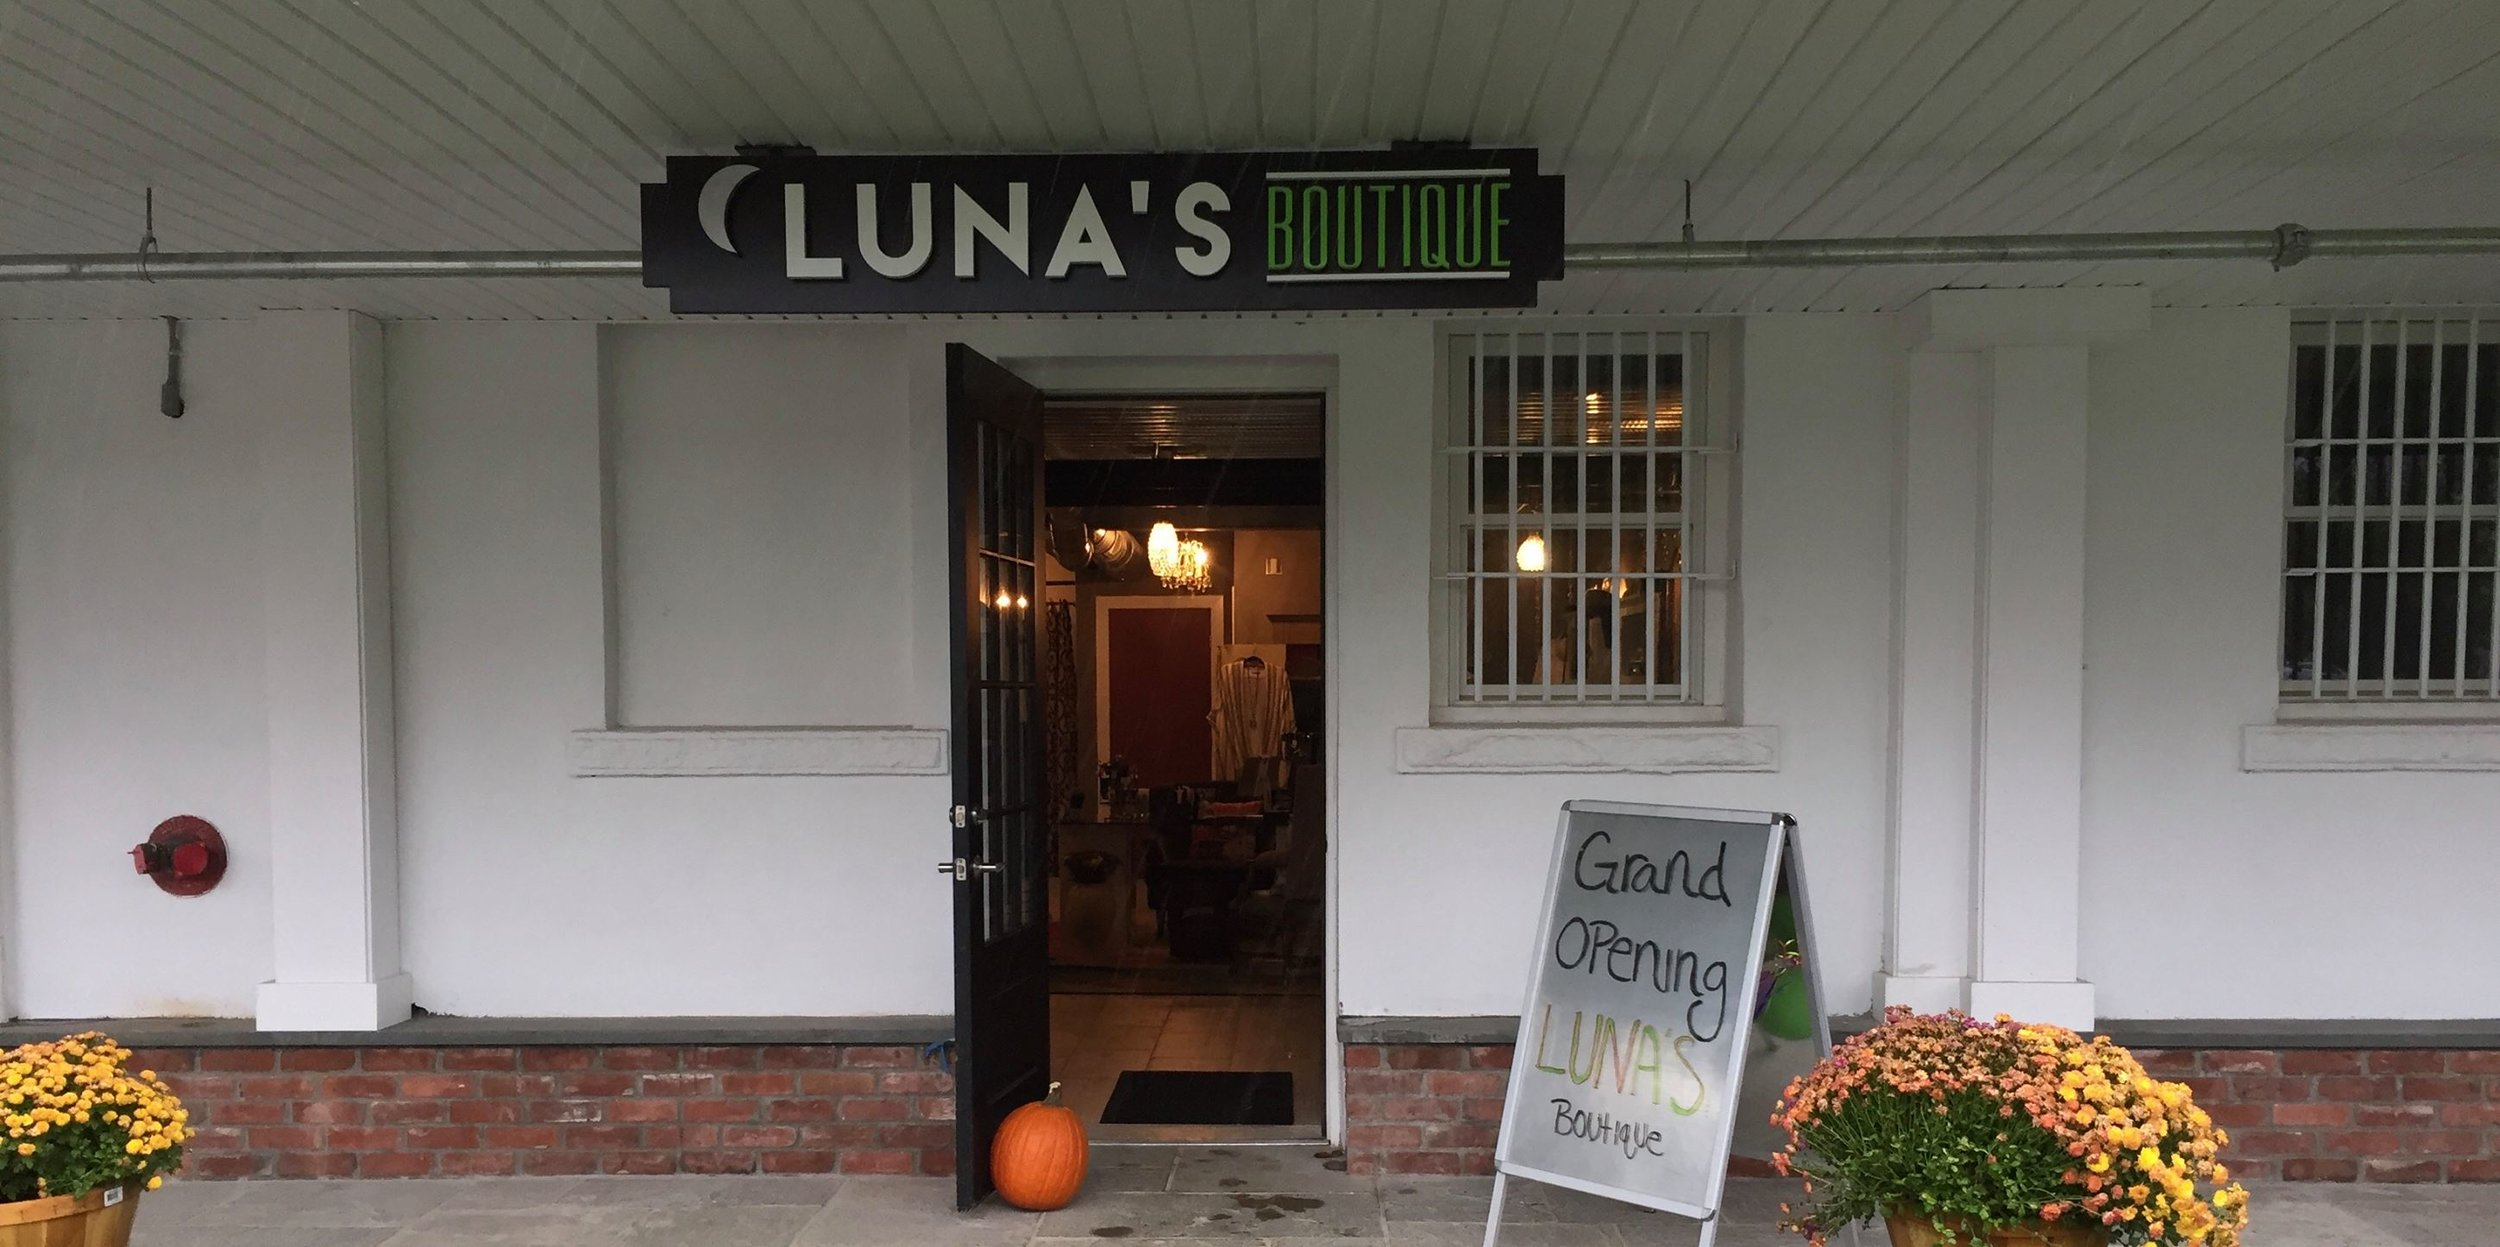 Lunas-boutique.jpg